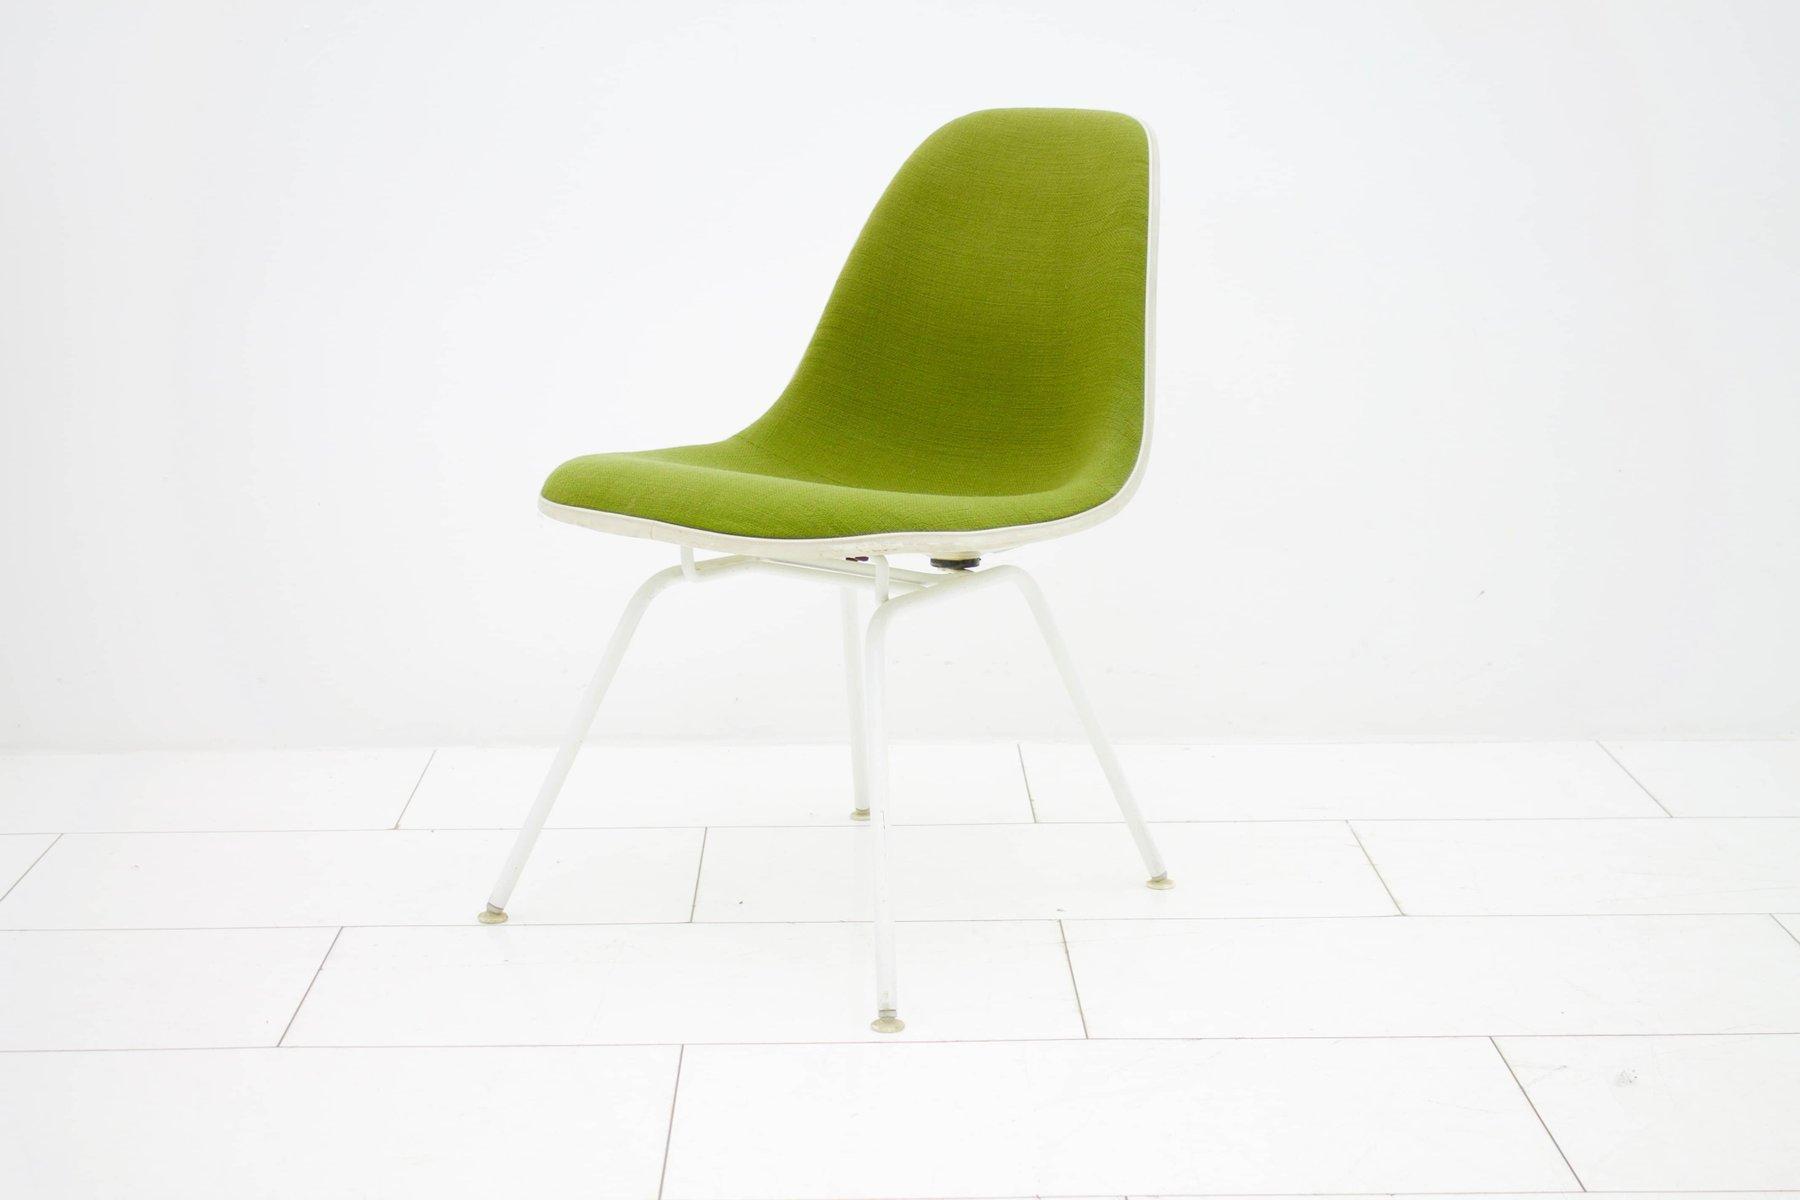 Grüner Vintage Sessel von Charles & Ray Eames für Vitra, 1950er